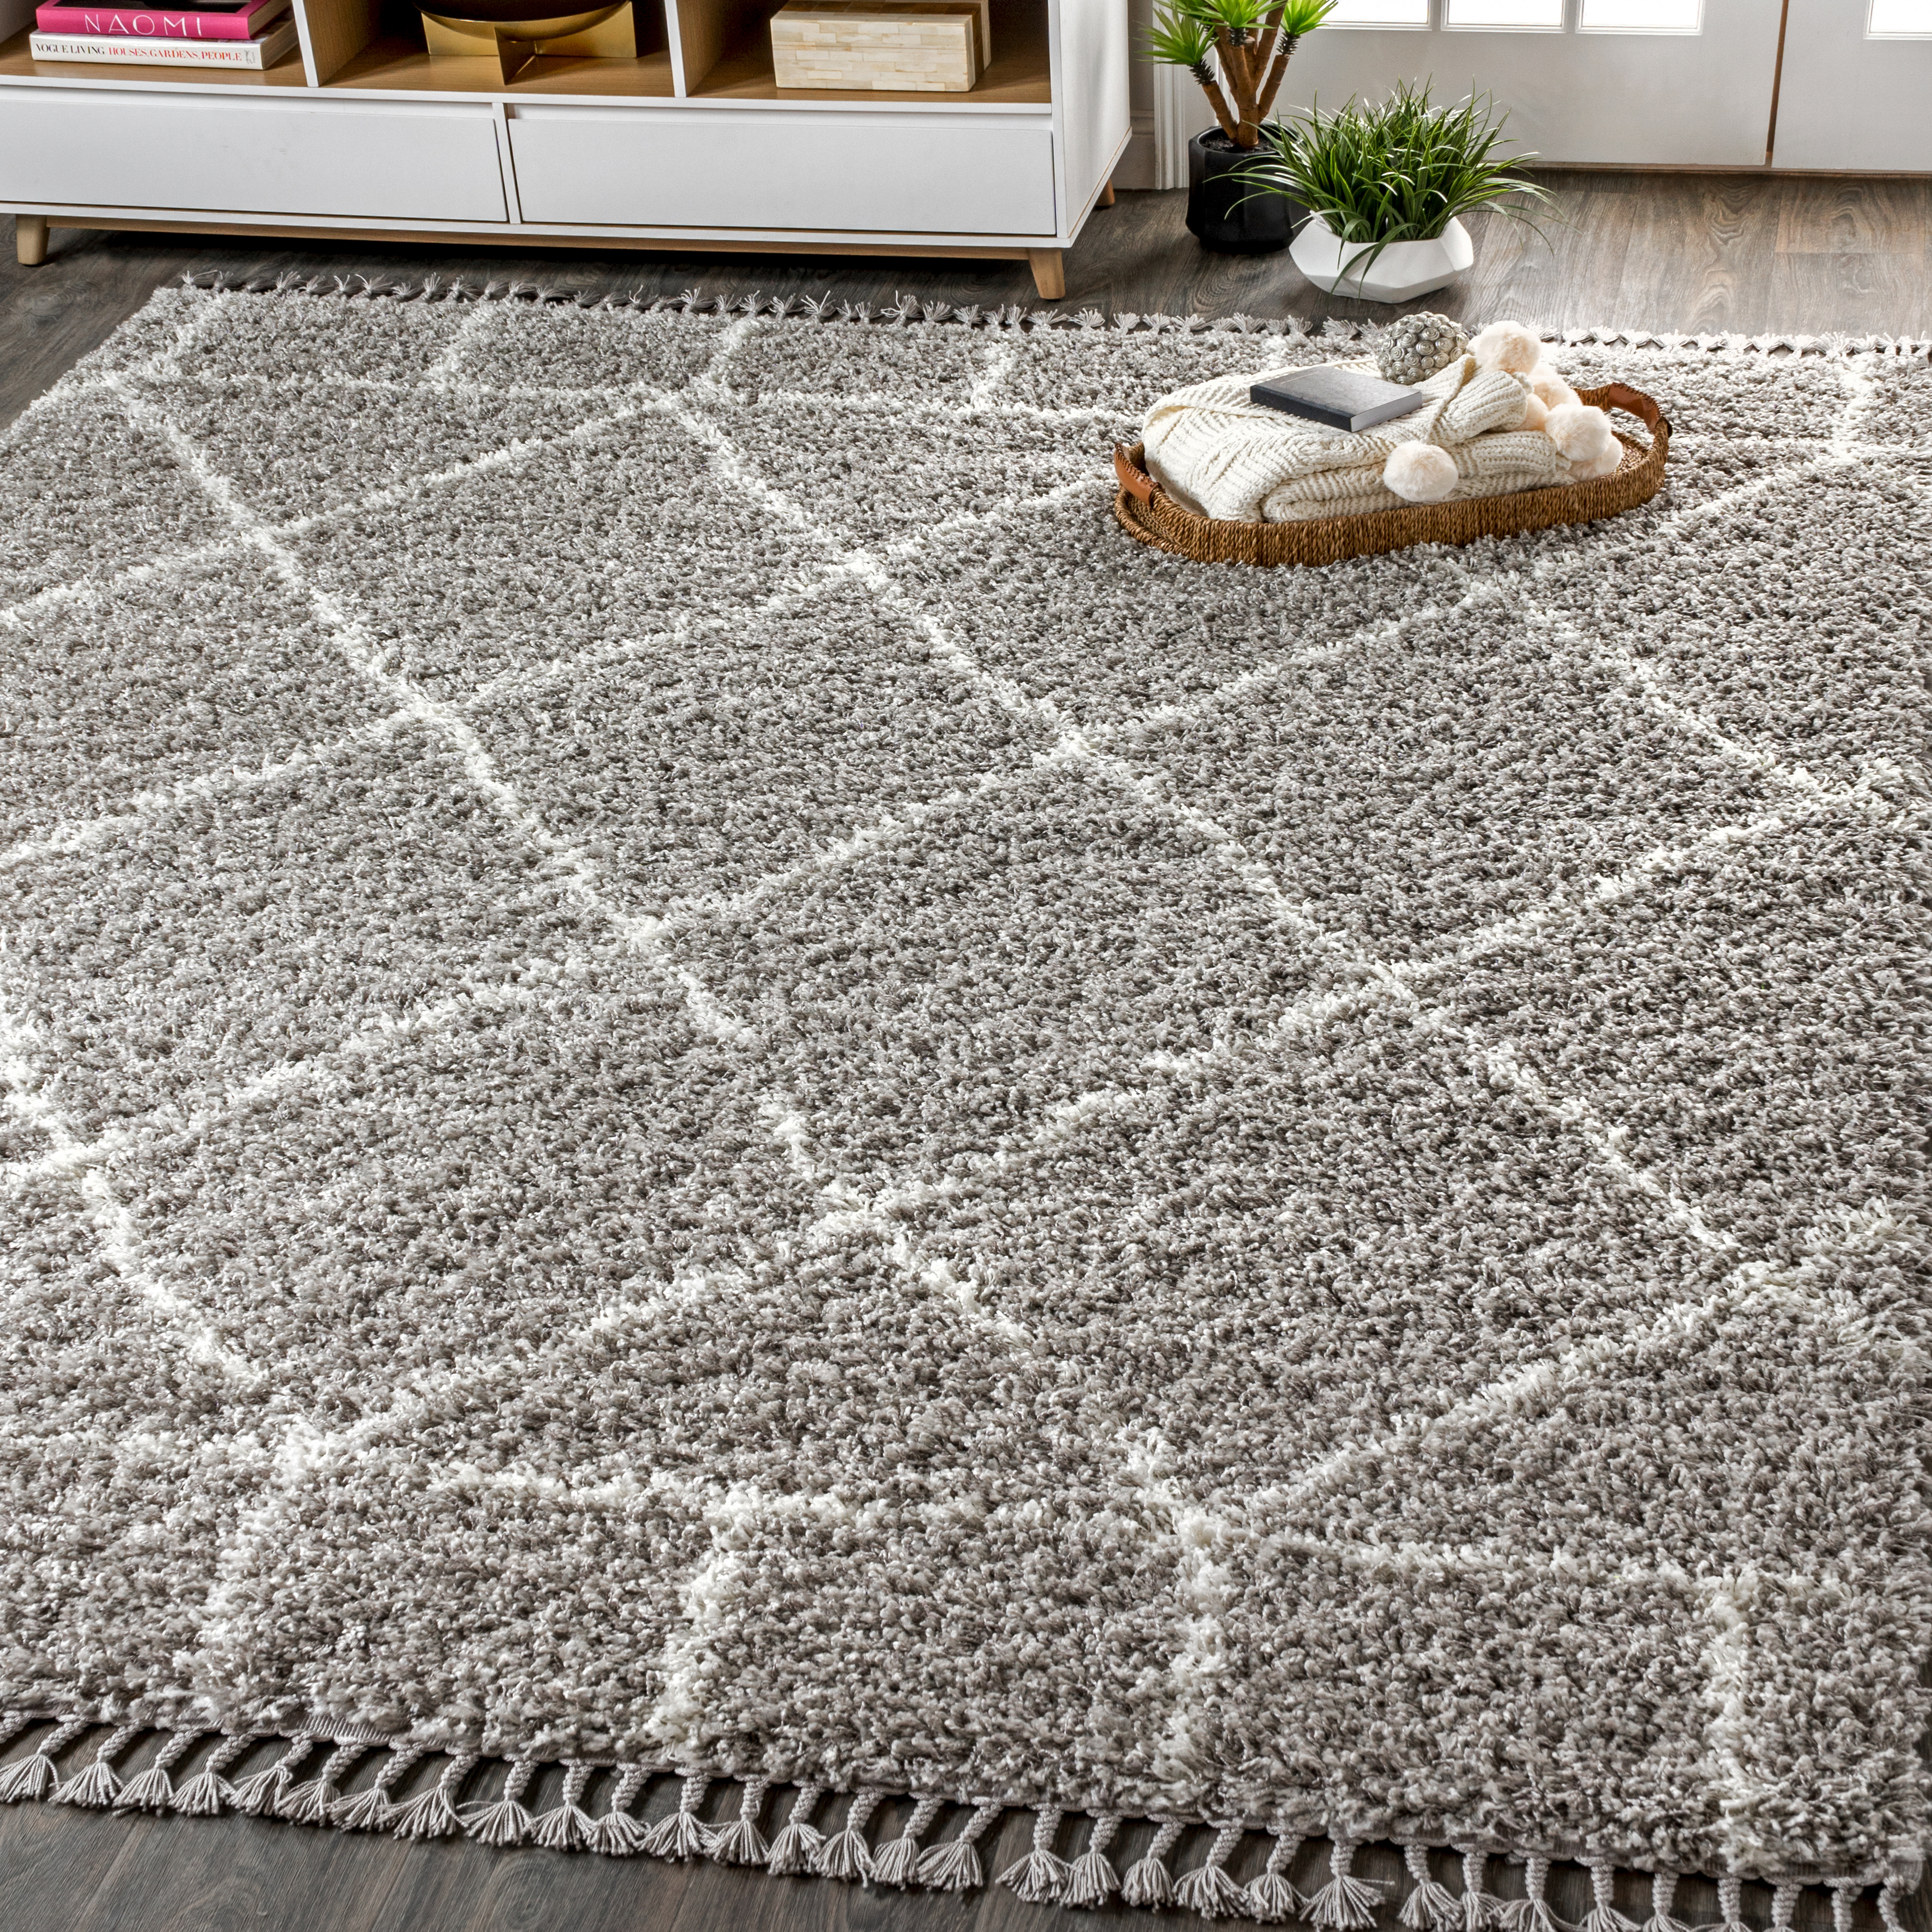 Mercer Shag Plush Tassel Moroccan Geometric Trellis Grey/Cream 4 ft. x 6 ft. Area Rug